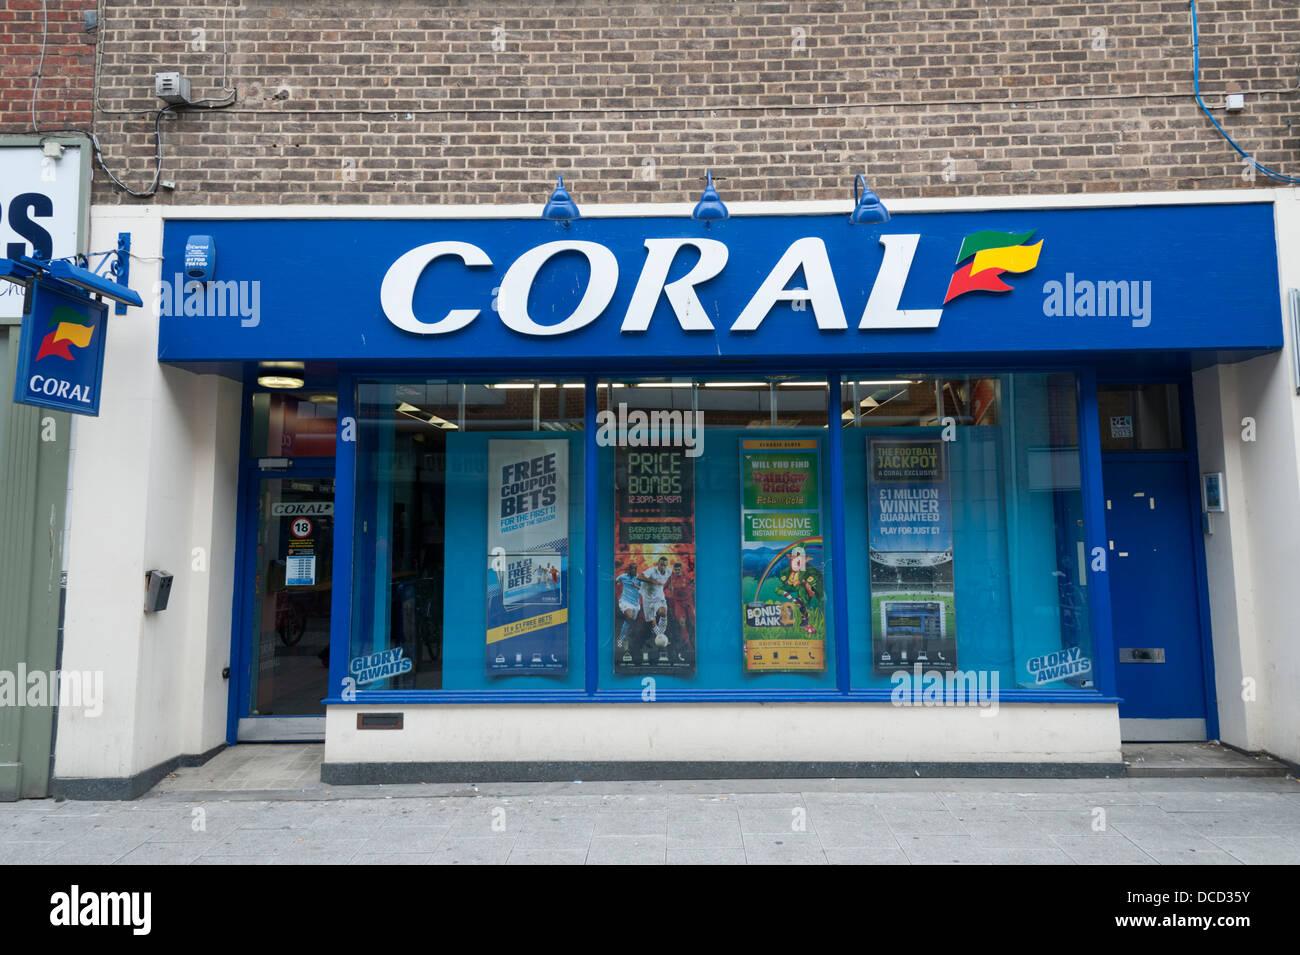 m v corals betting